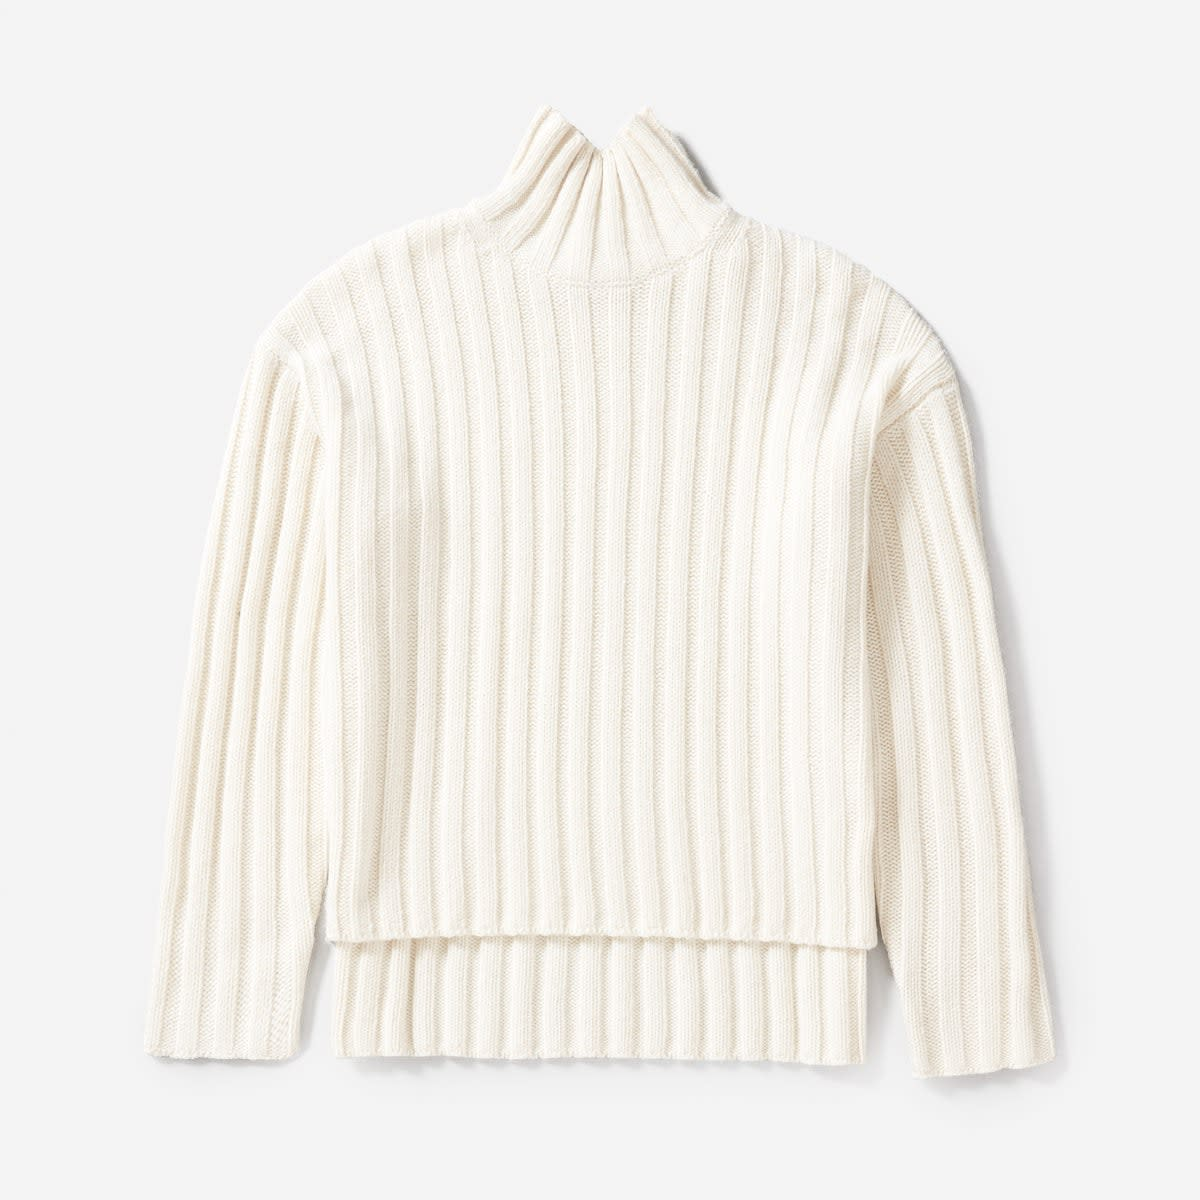 Wool-cashmere rib oversized turtleneck, $125, available at Everlane